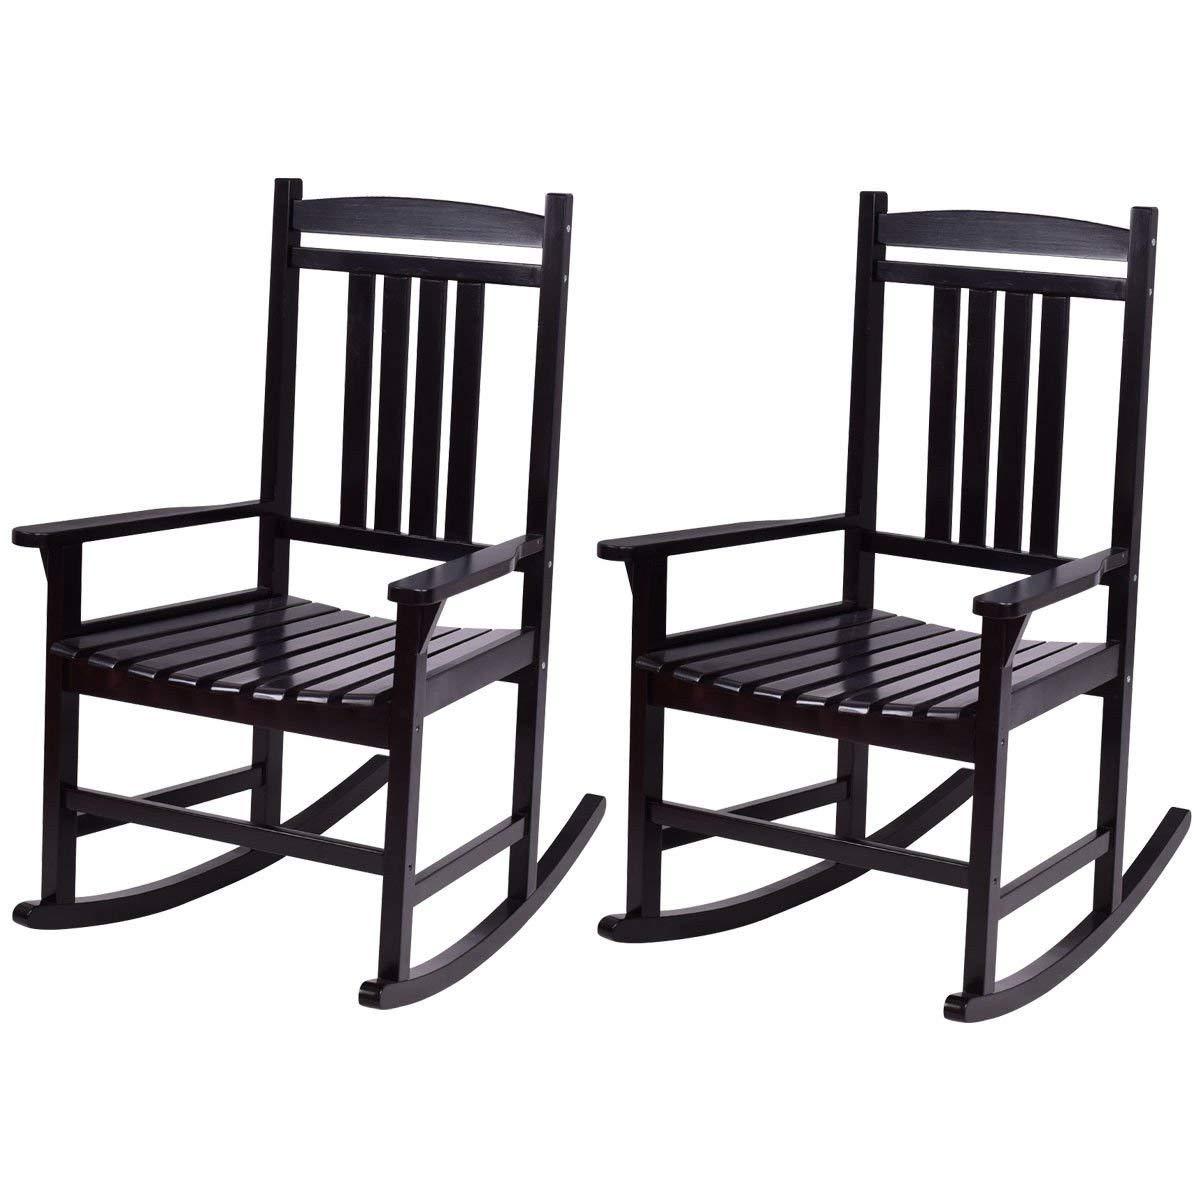 Casart Set of 2 Wood Rocking Chair Outdoor Indoor Patio Porch Rocker for Porch, Patio, Living Room, Black